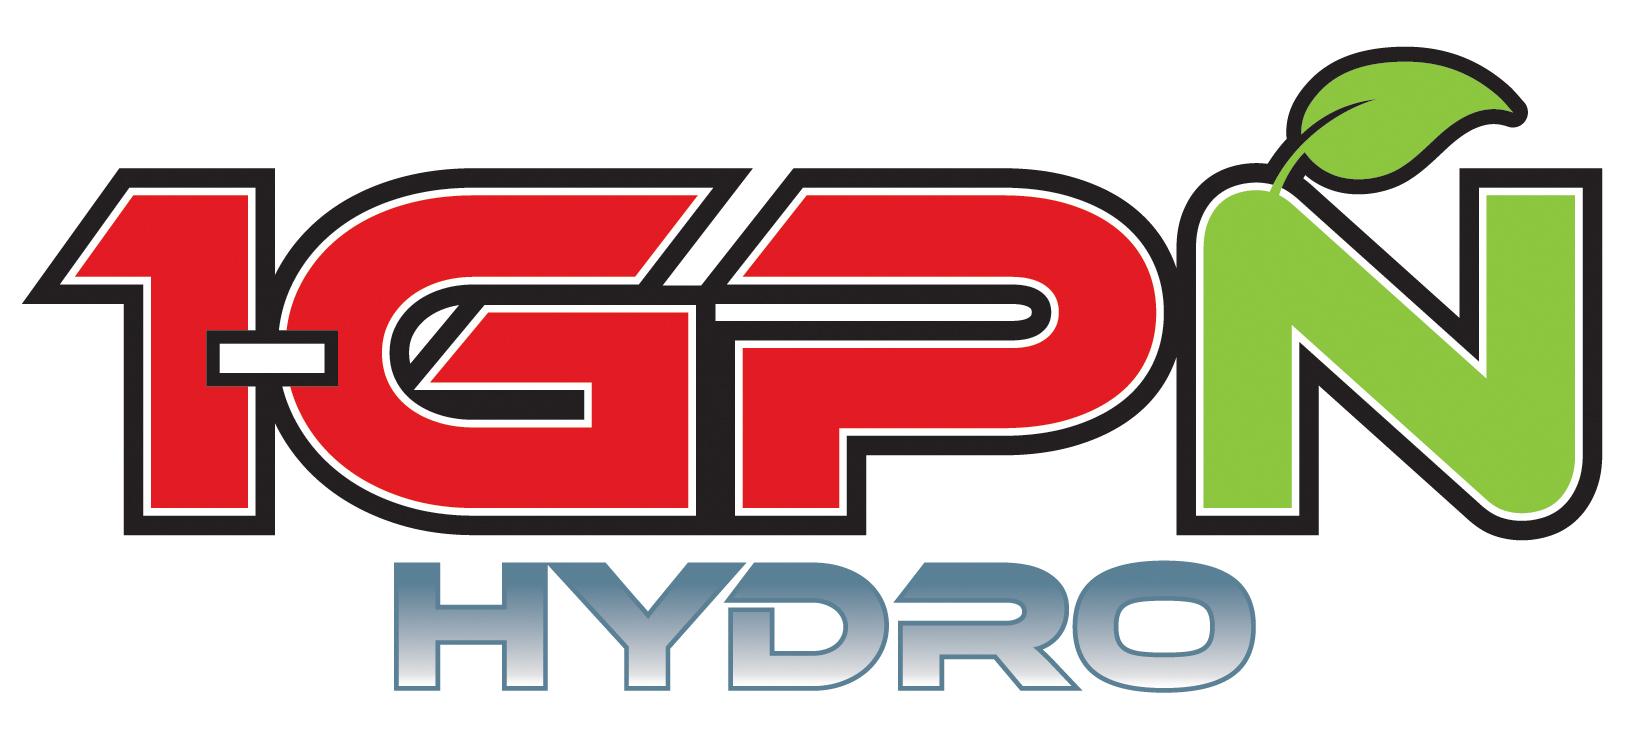 1-GPN Poultry Hydro Logo